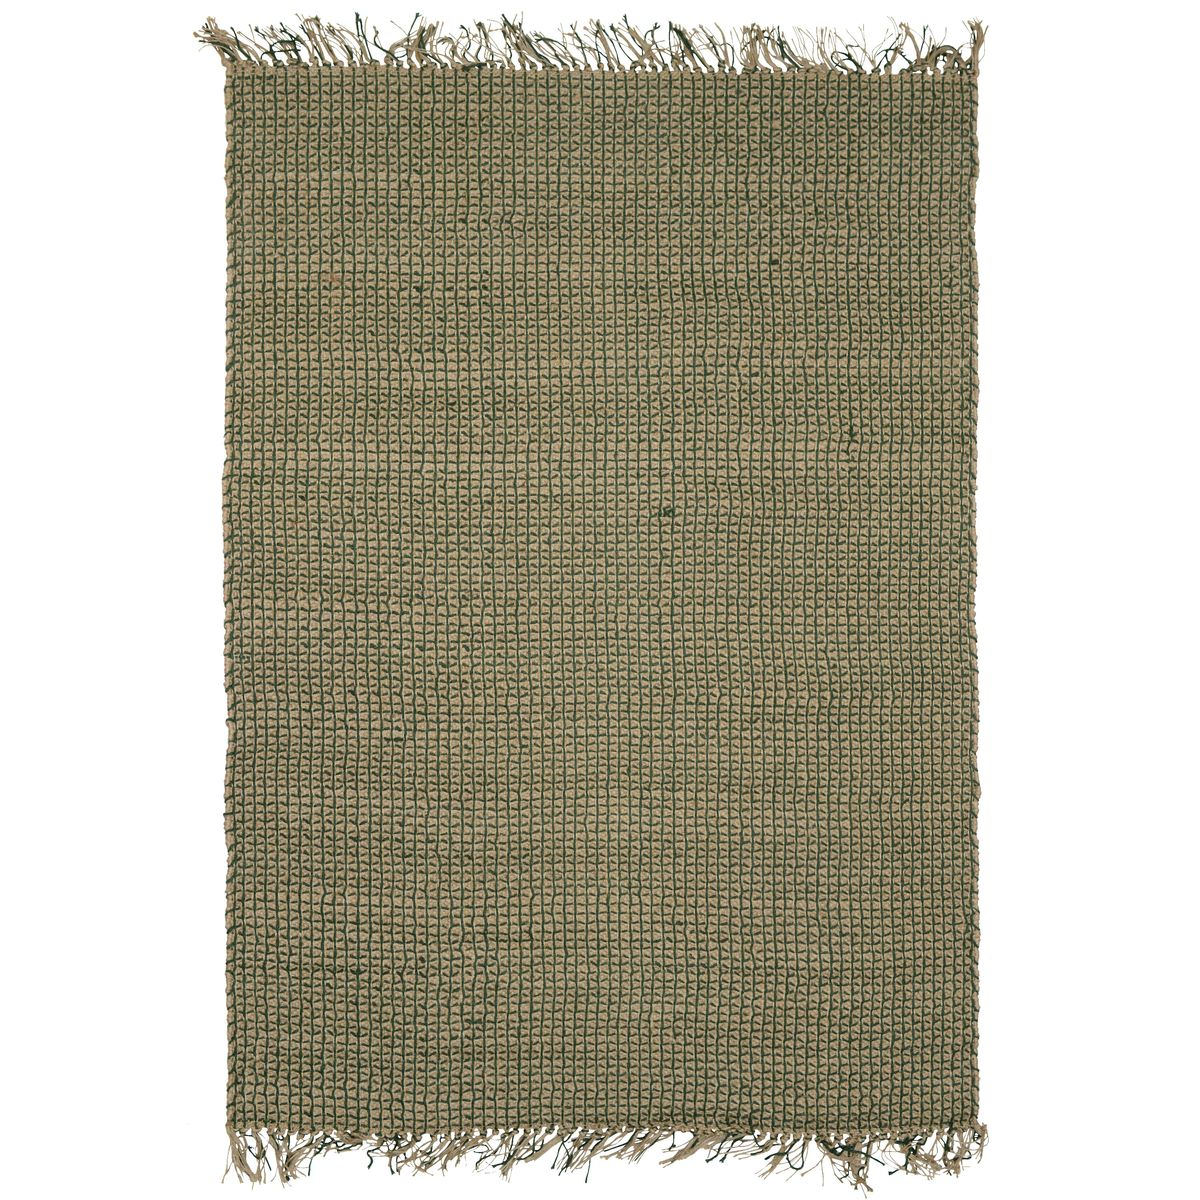 Tapis en jute et coton vert 190x290